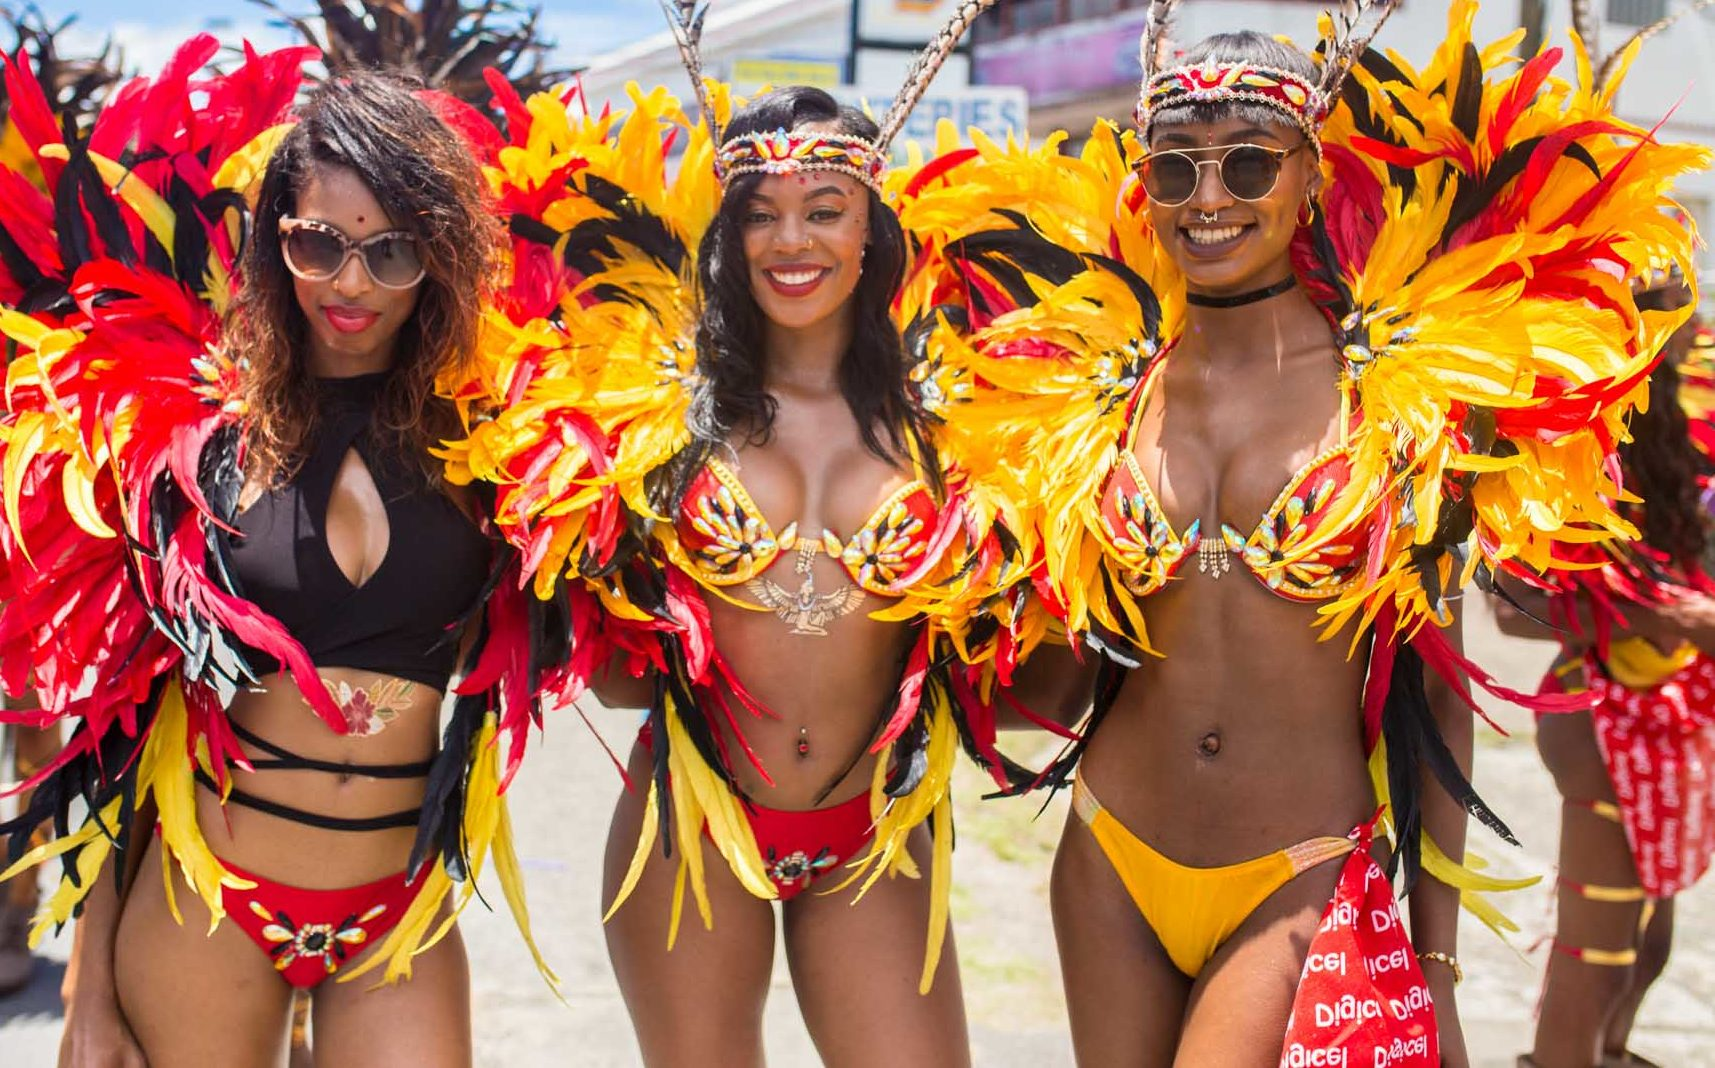 lucian-mas | SOCA ISLANDS - Trinidad Carnival 2020, Jamaica